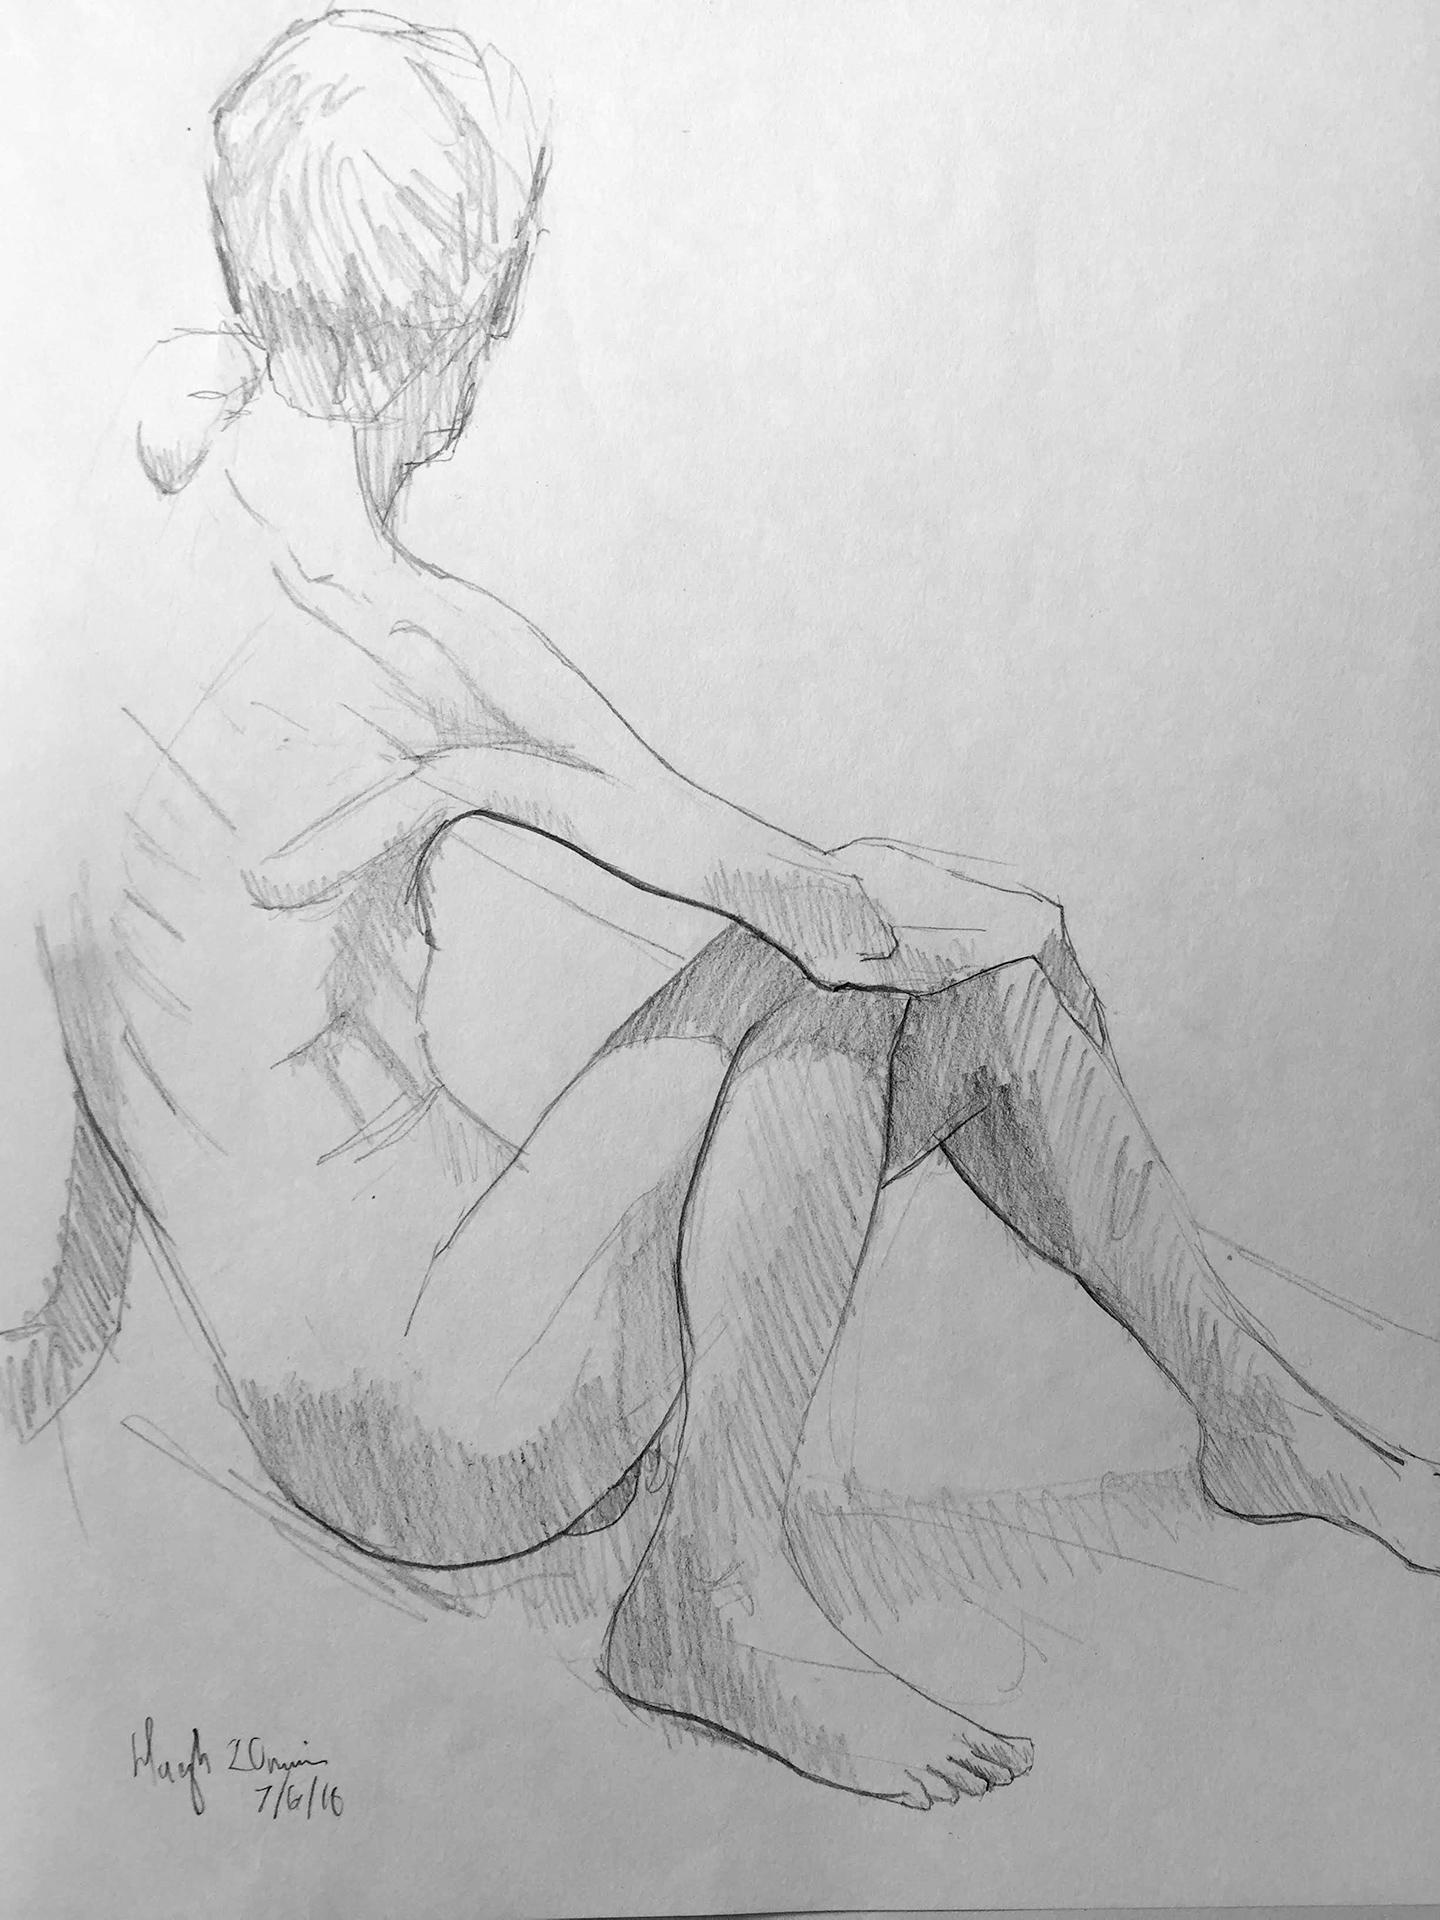 Life Drawing Sketch 2, 7/6/18